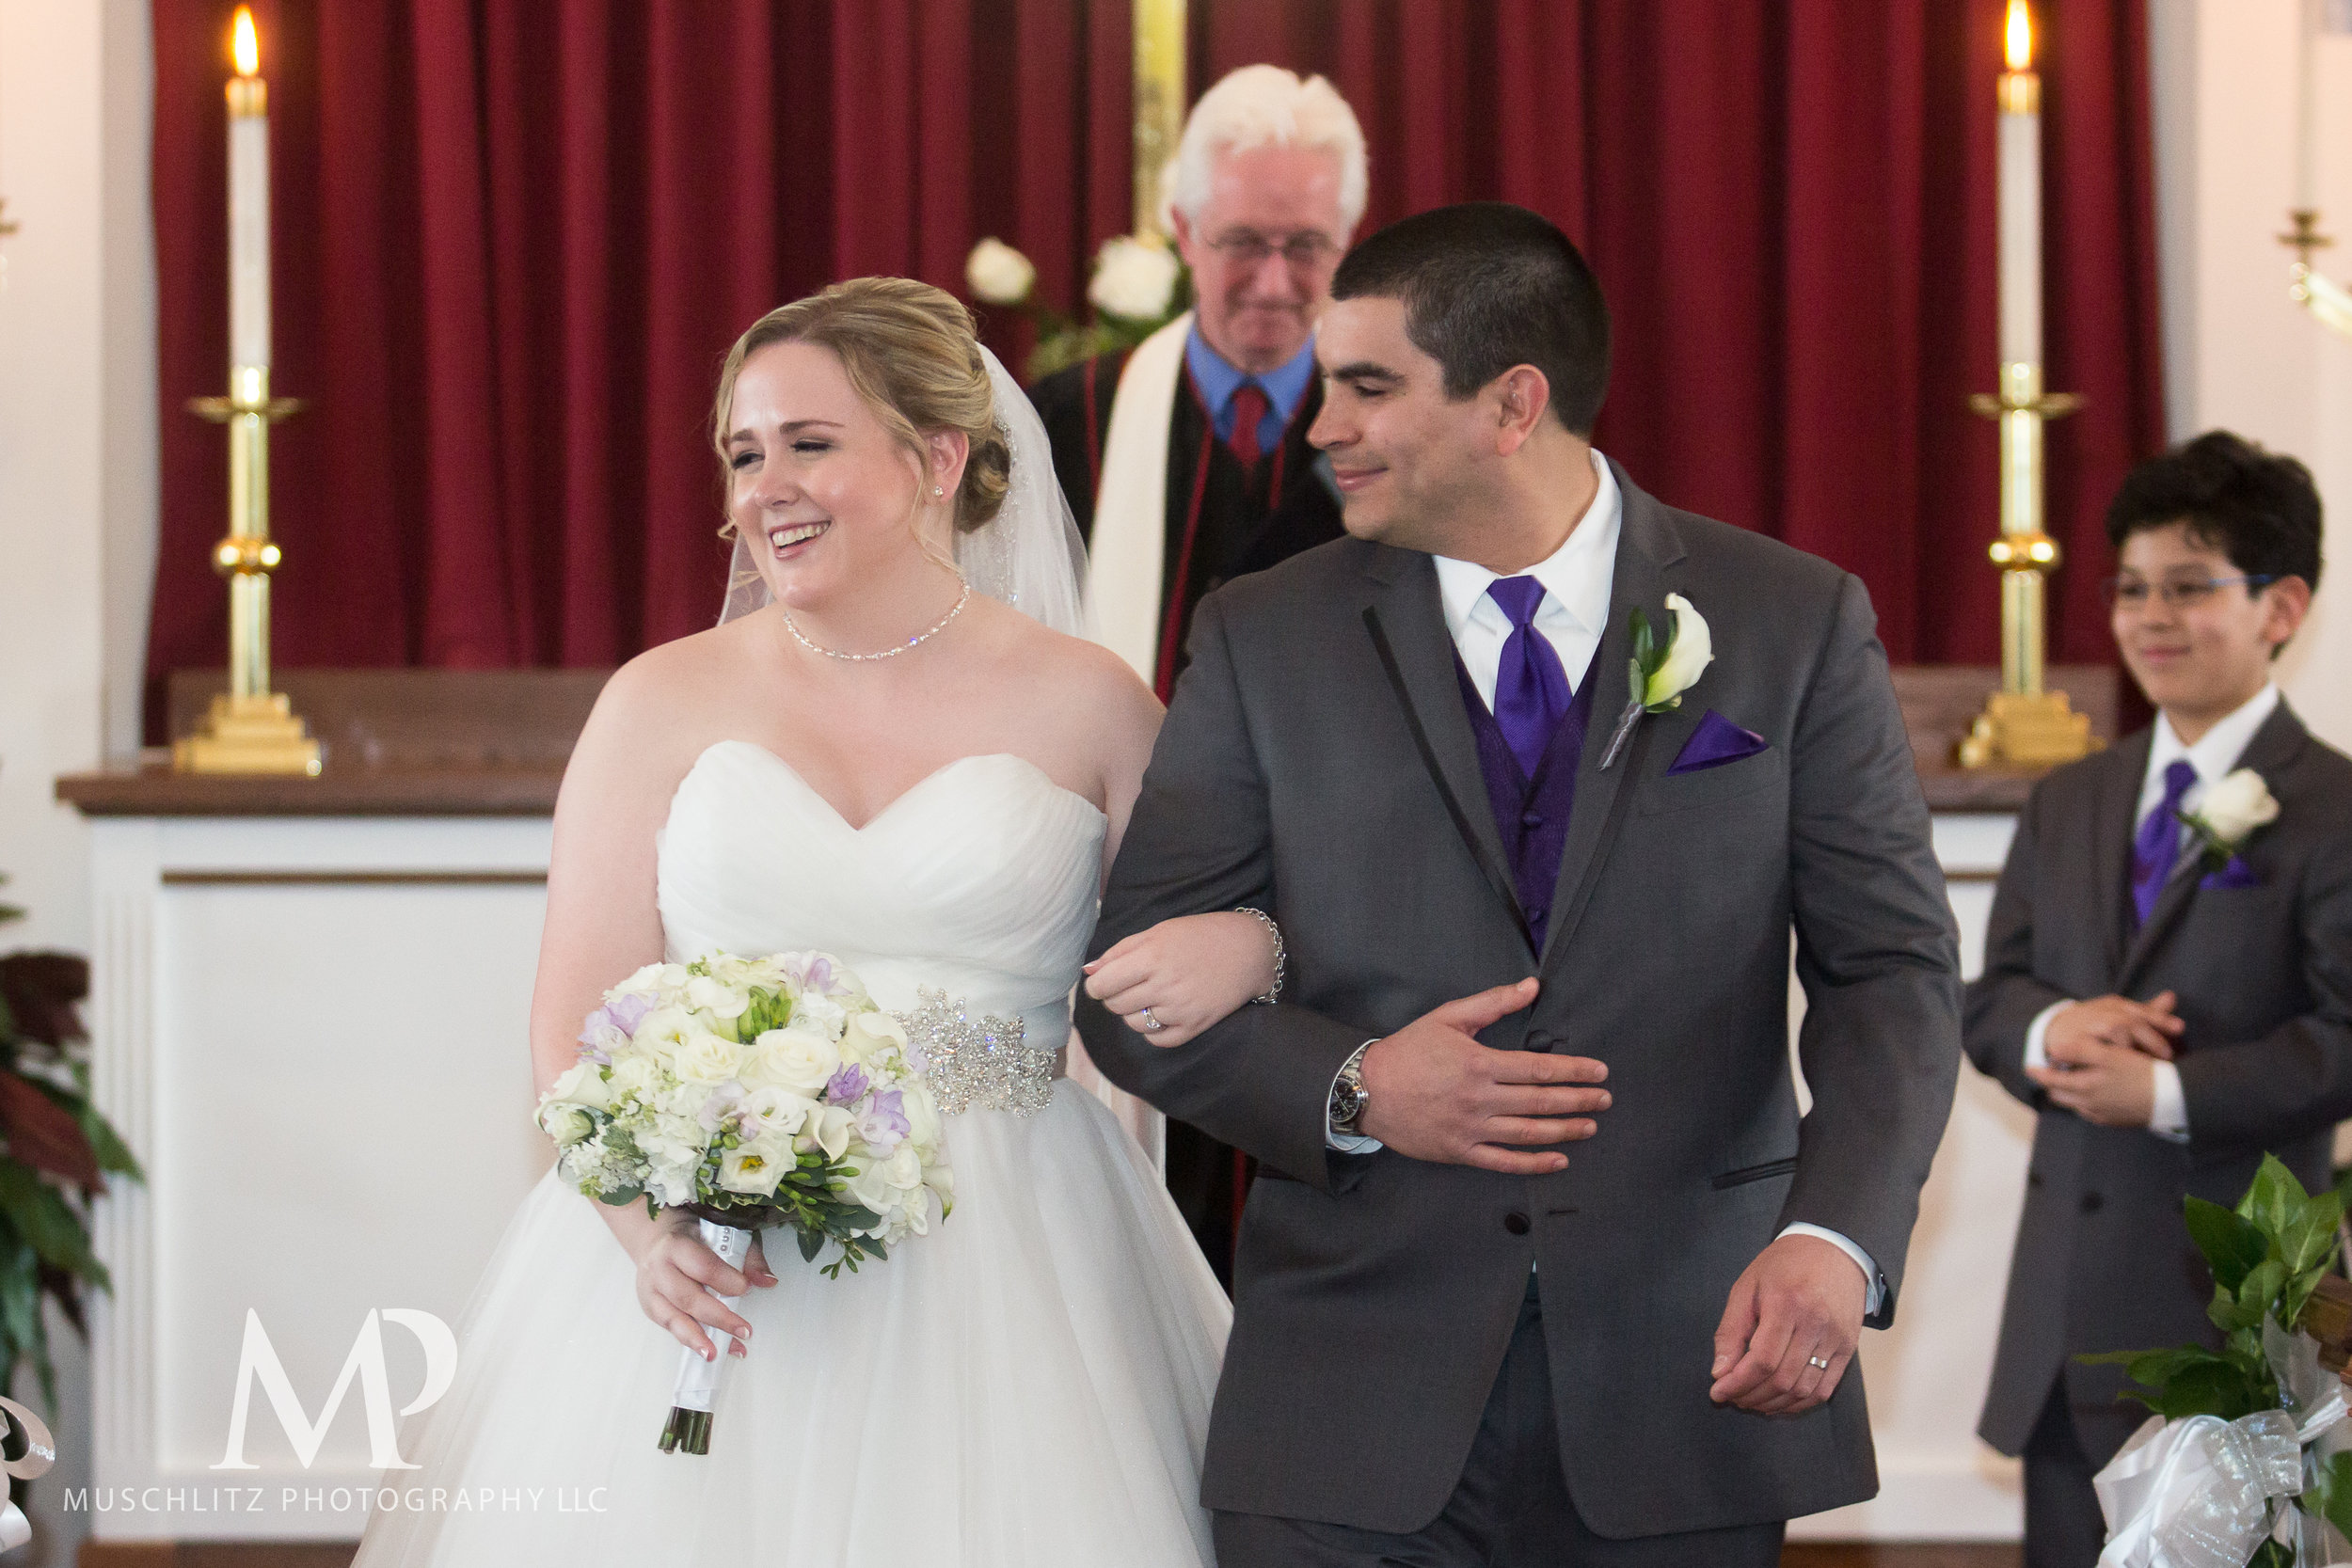 dublin-community-church-wedding-columbus-ohio-muschlitz-photography-061.JPG